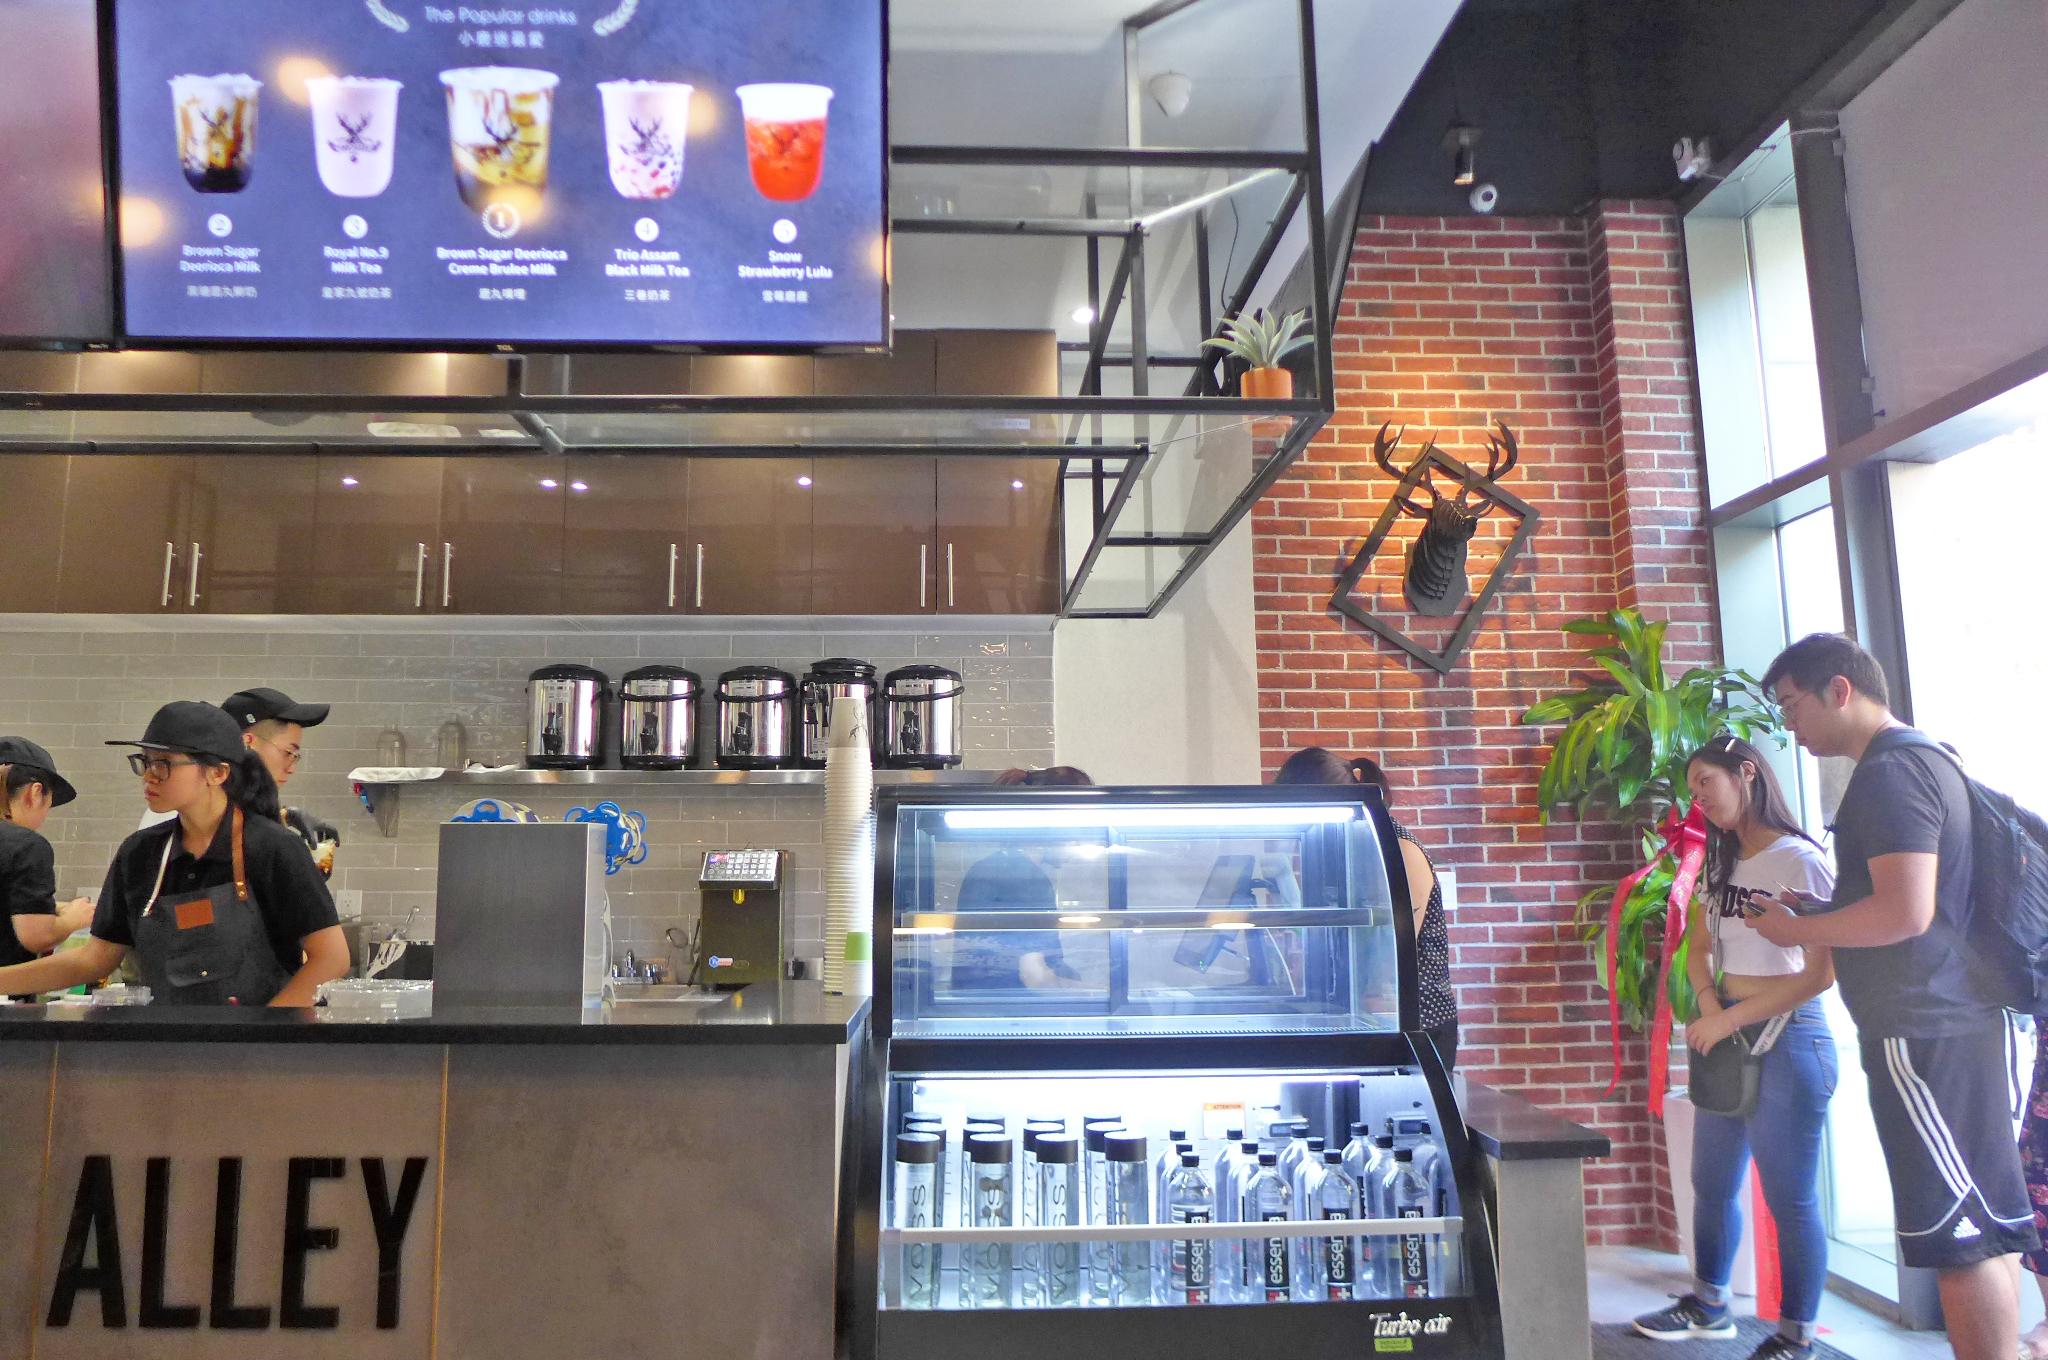 NYC's Newest Bubble Tea Shop Is a Caramelized Burnt Sugar Delight